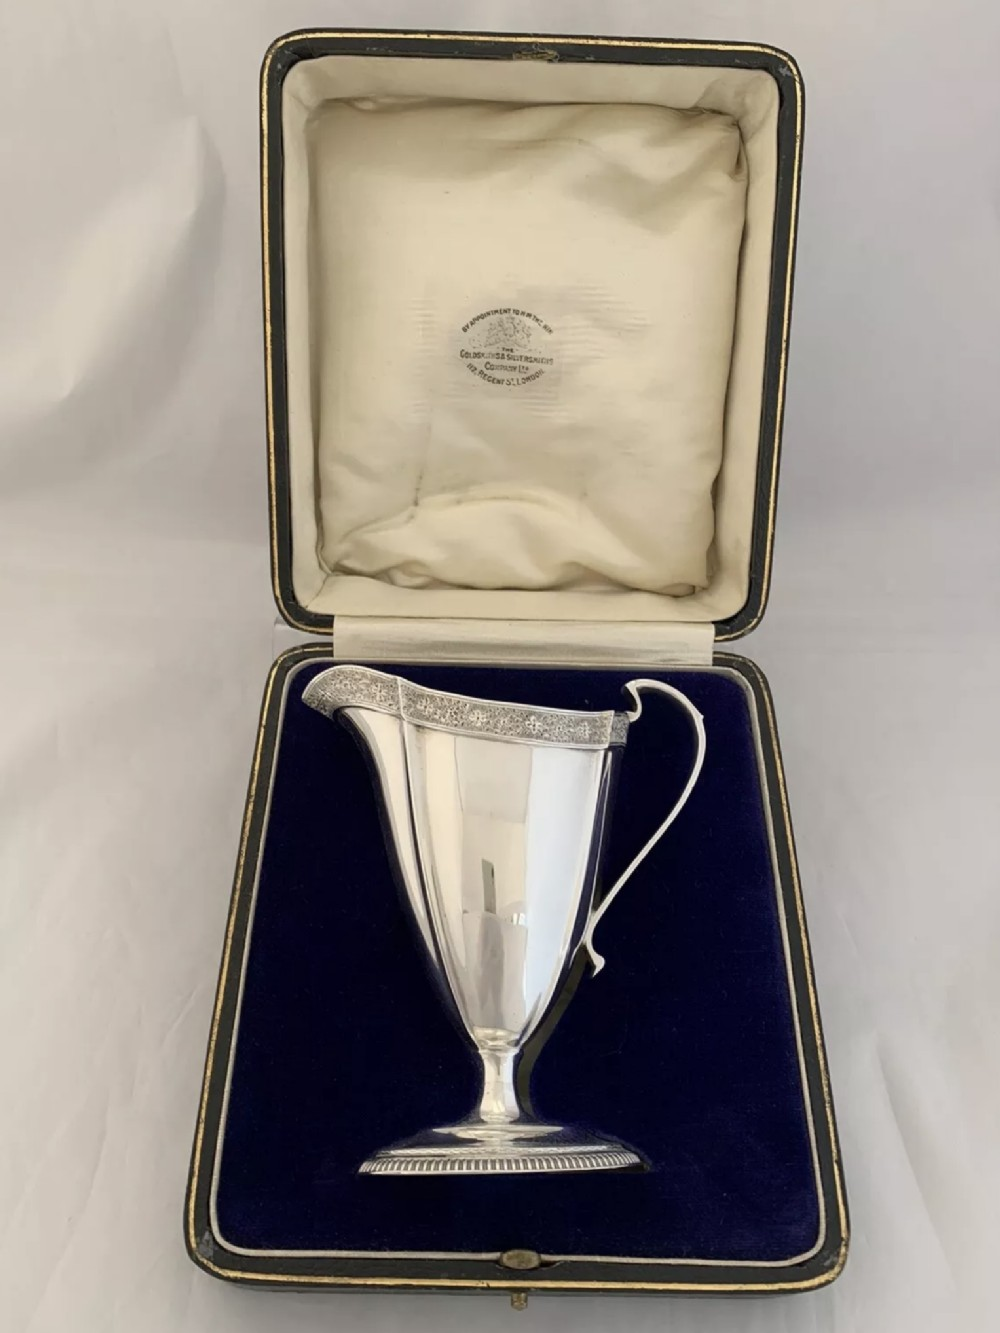 antique silver cream jug or milk jug 1925 london goldsmiths silversmiths ltd